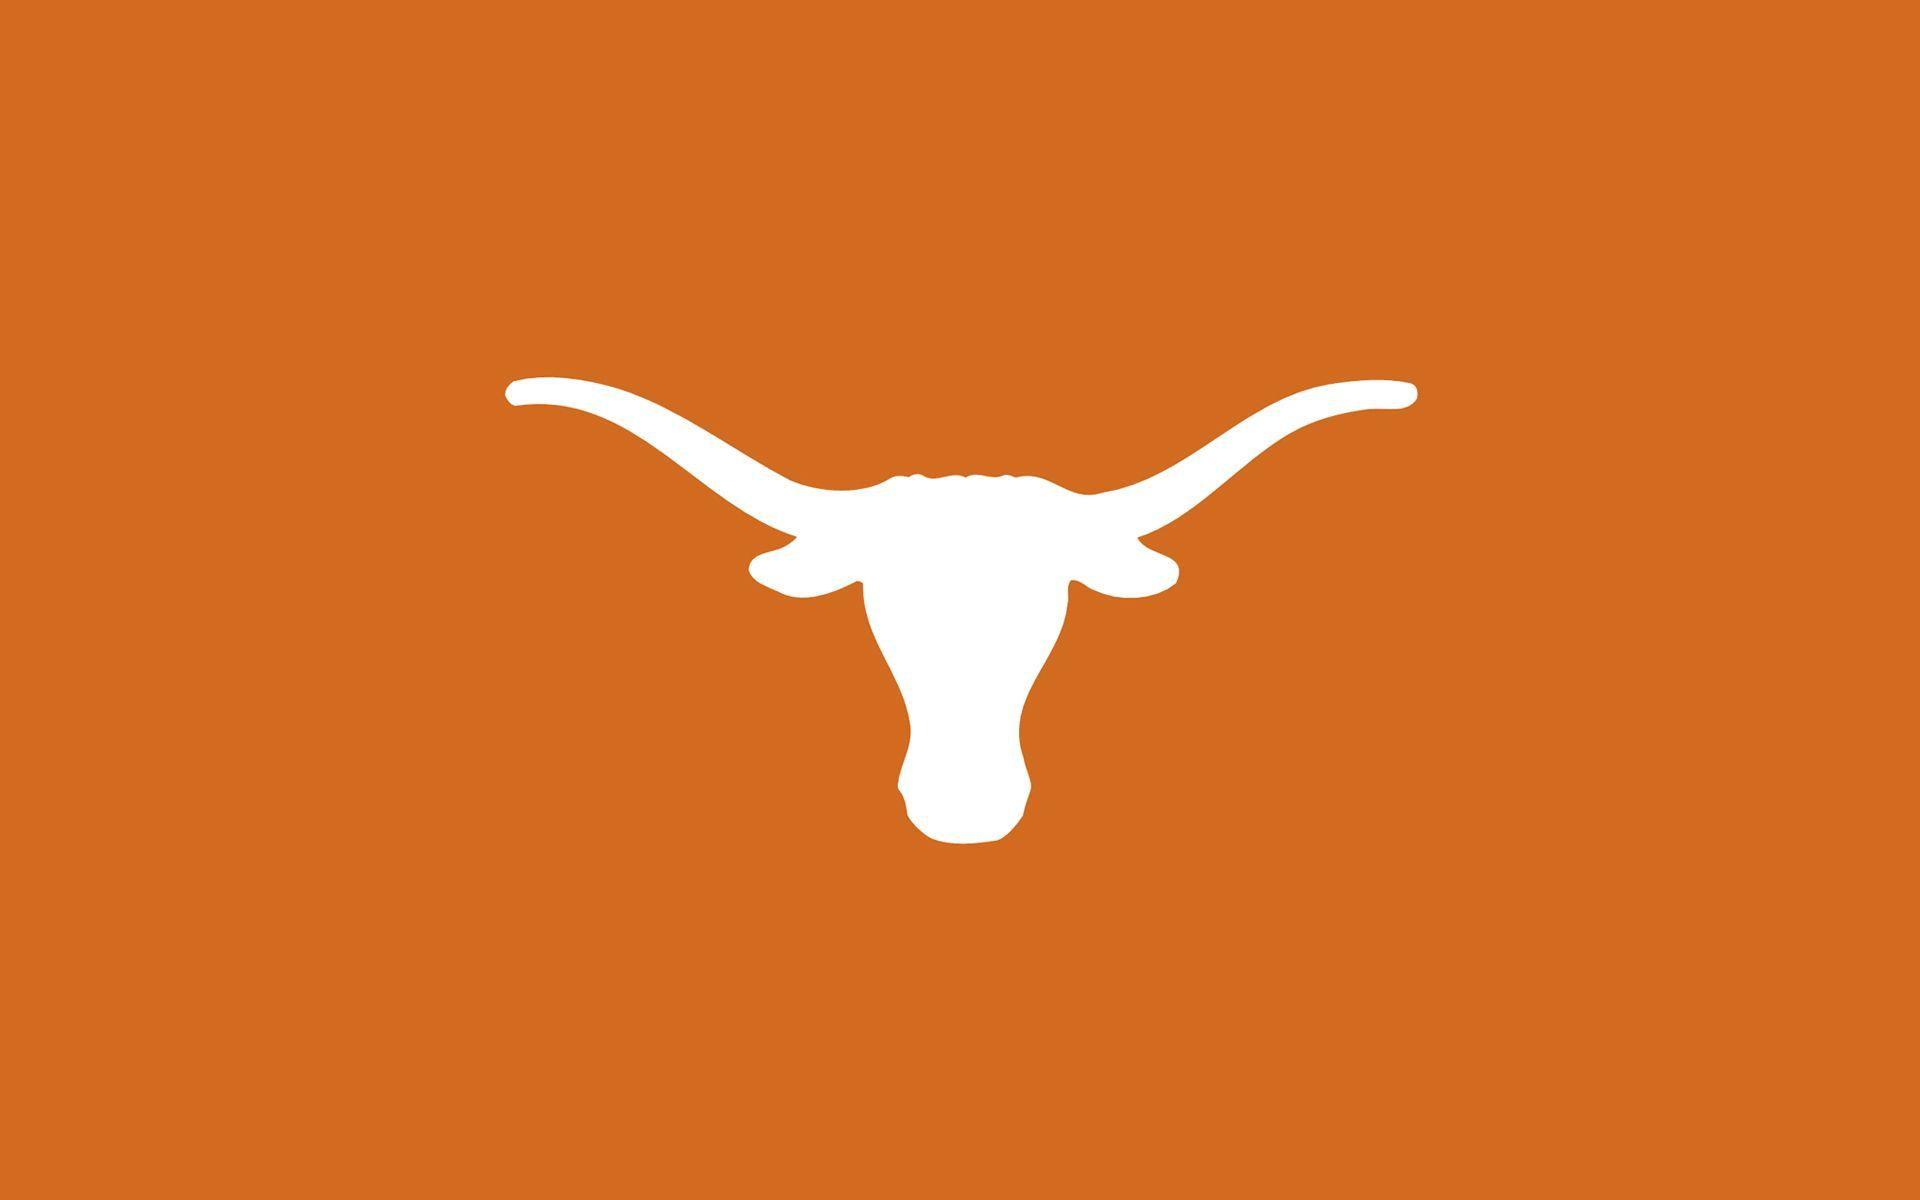 College Football Wallpapers Hd 2015 Texas Longhorns Football Wallpapers Wallpaper Cave